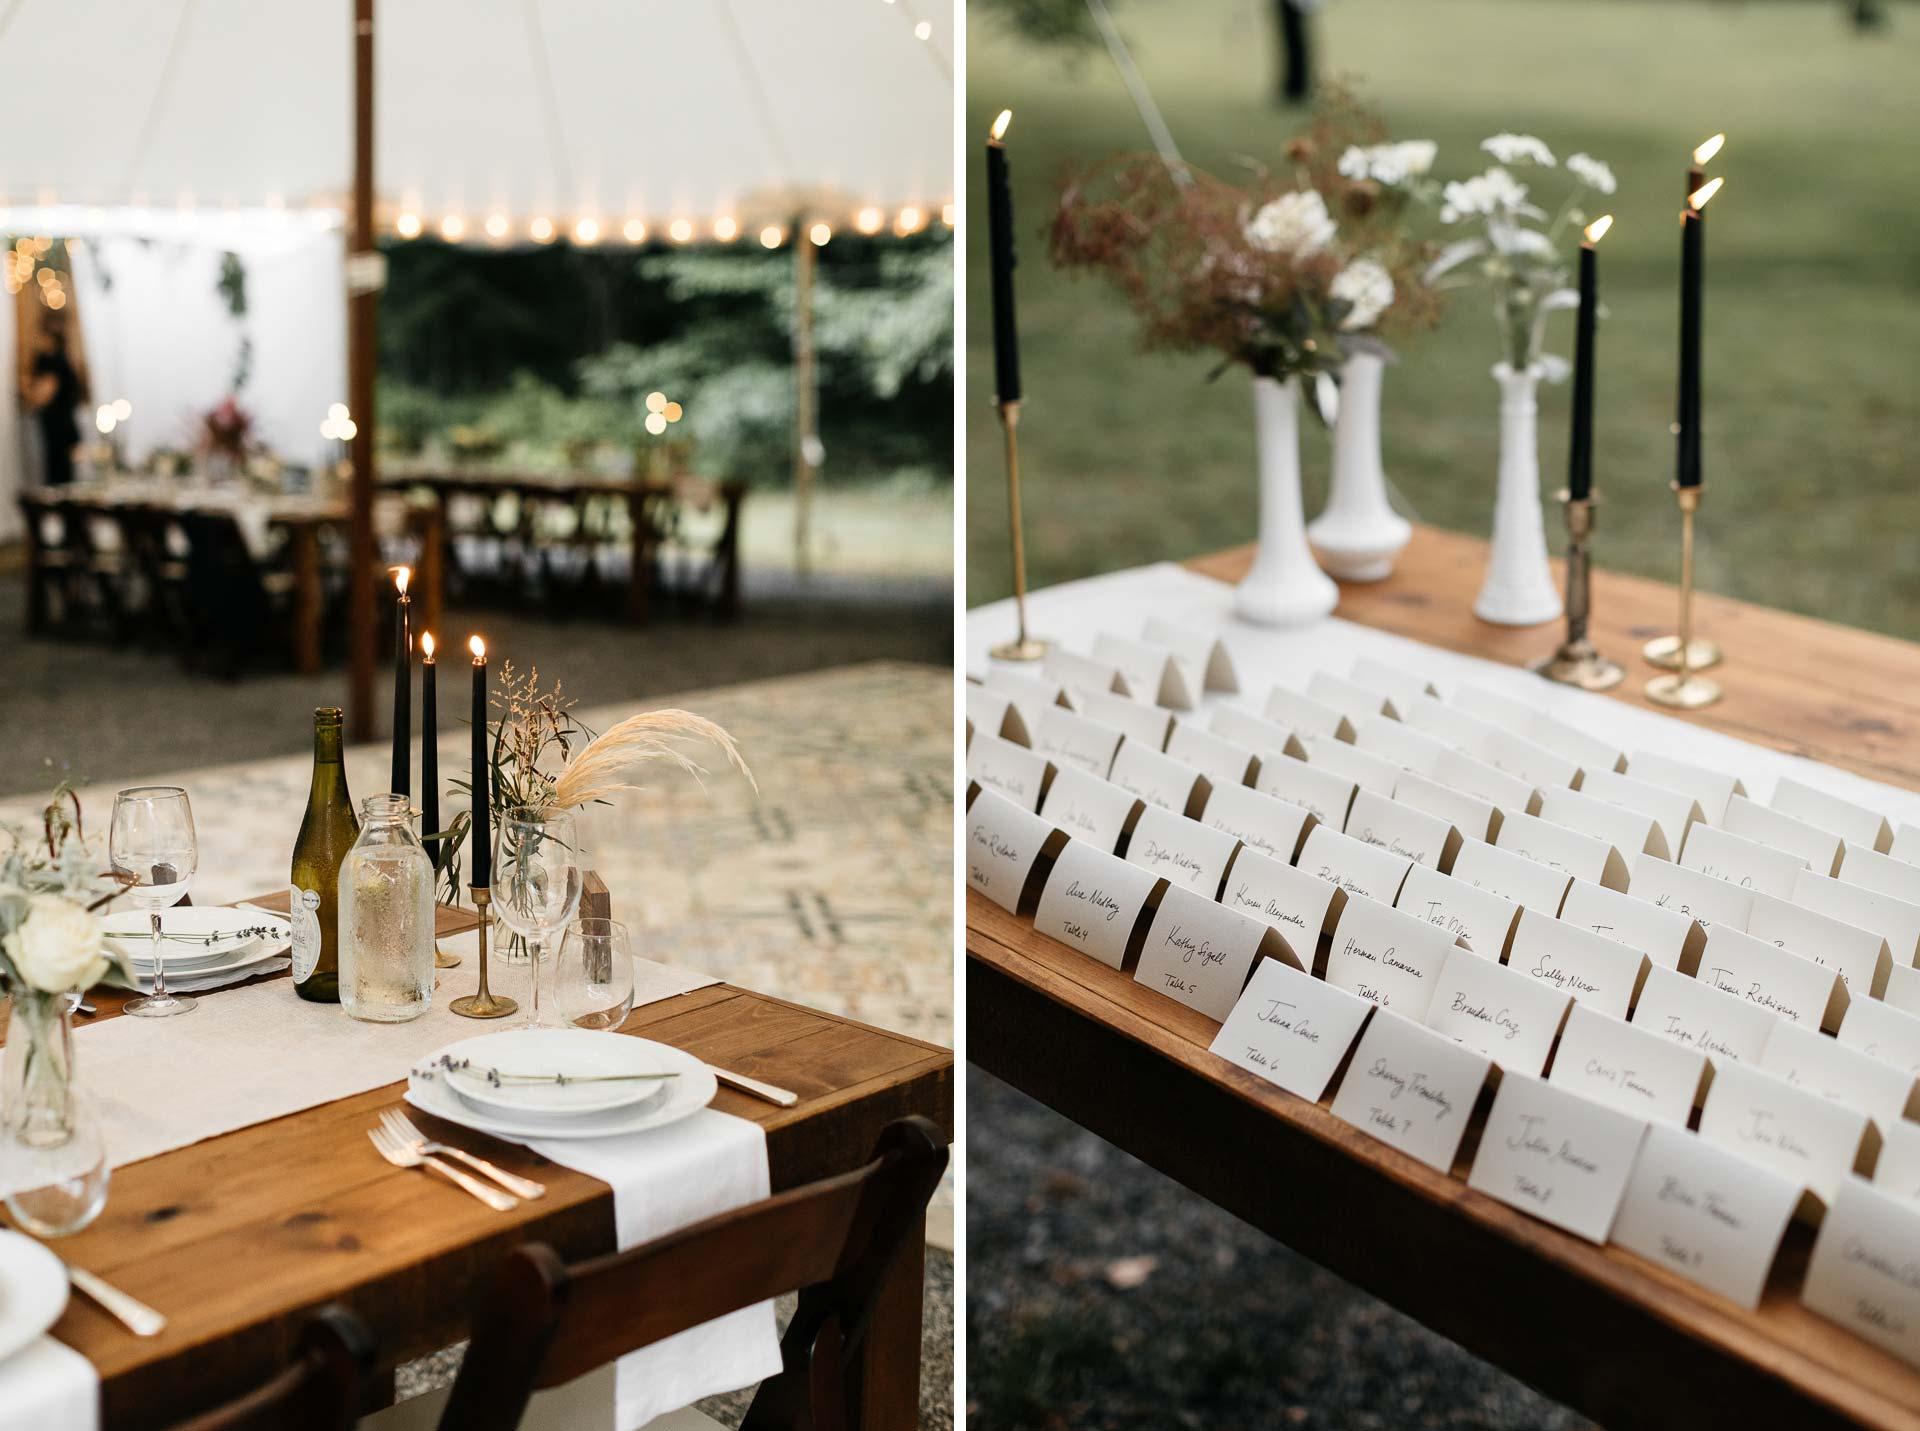 Rachel & David Boho Catskills wedding  at Foxfire Moutain House by Jean-Laurent Gaudy